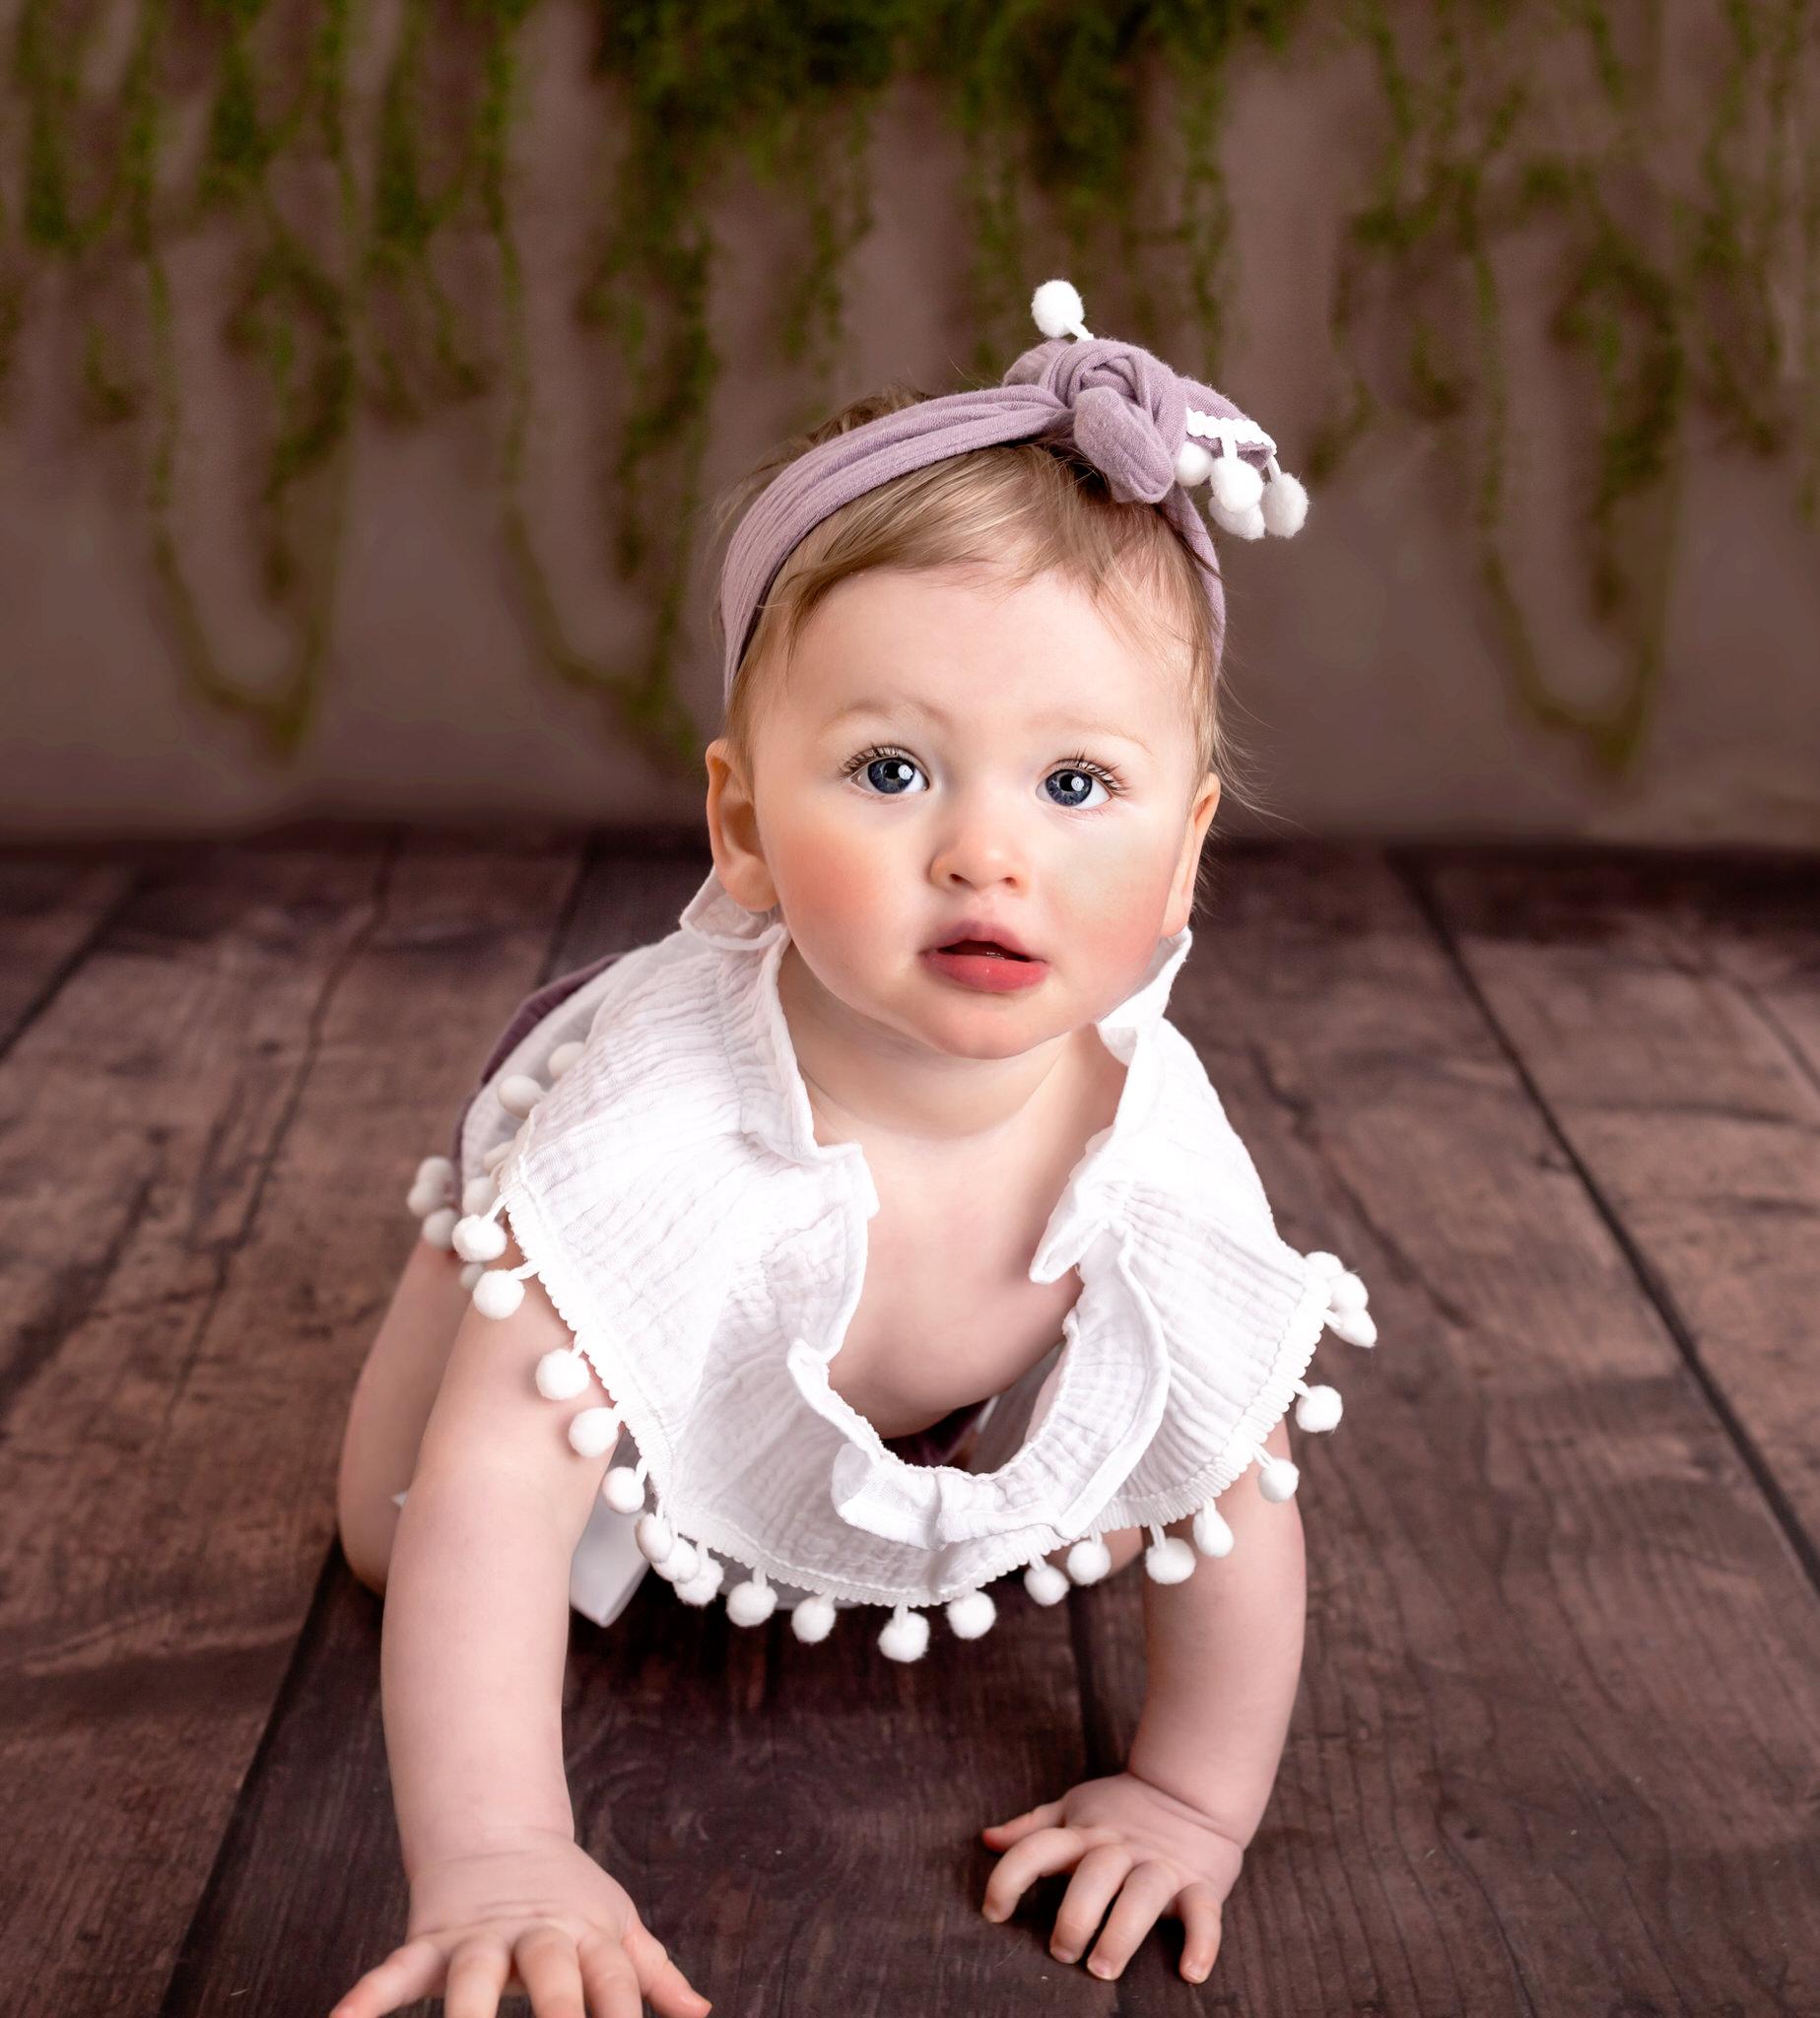 Baby girl crawls on the floor of Sevenoaks baby photography studio